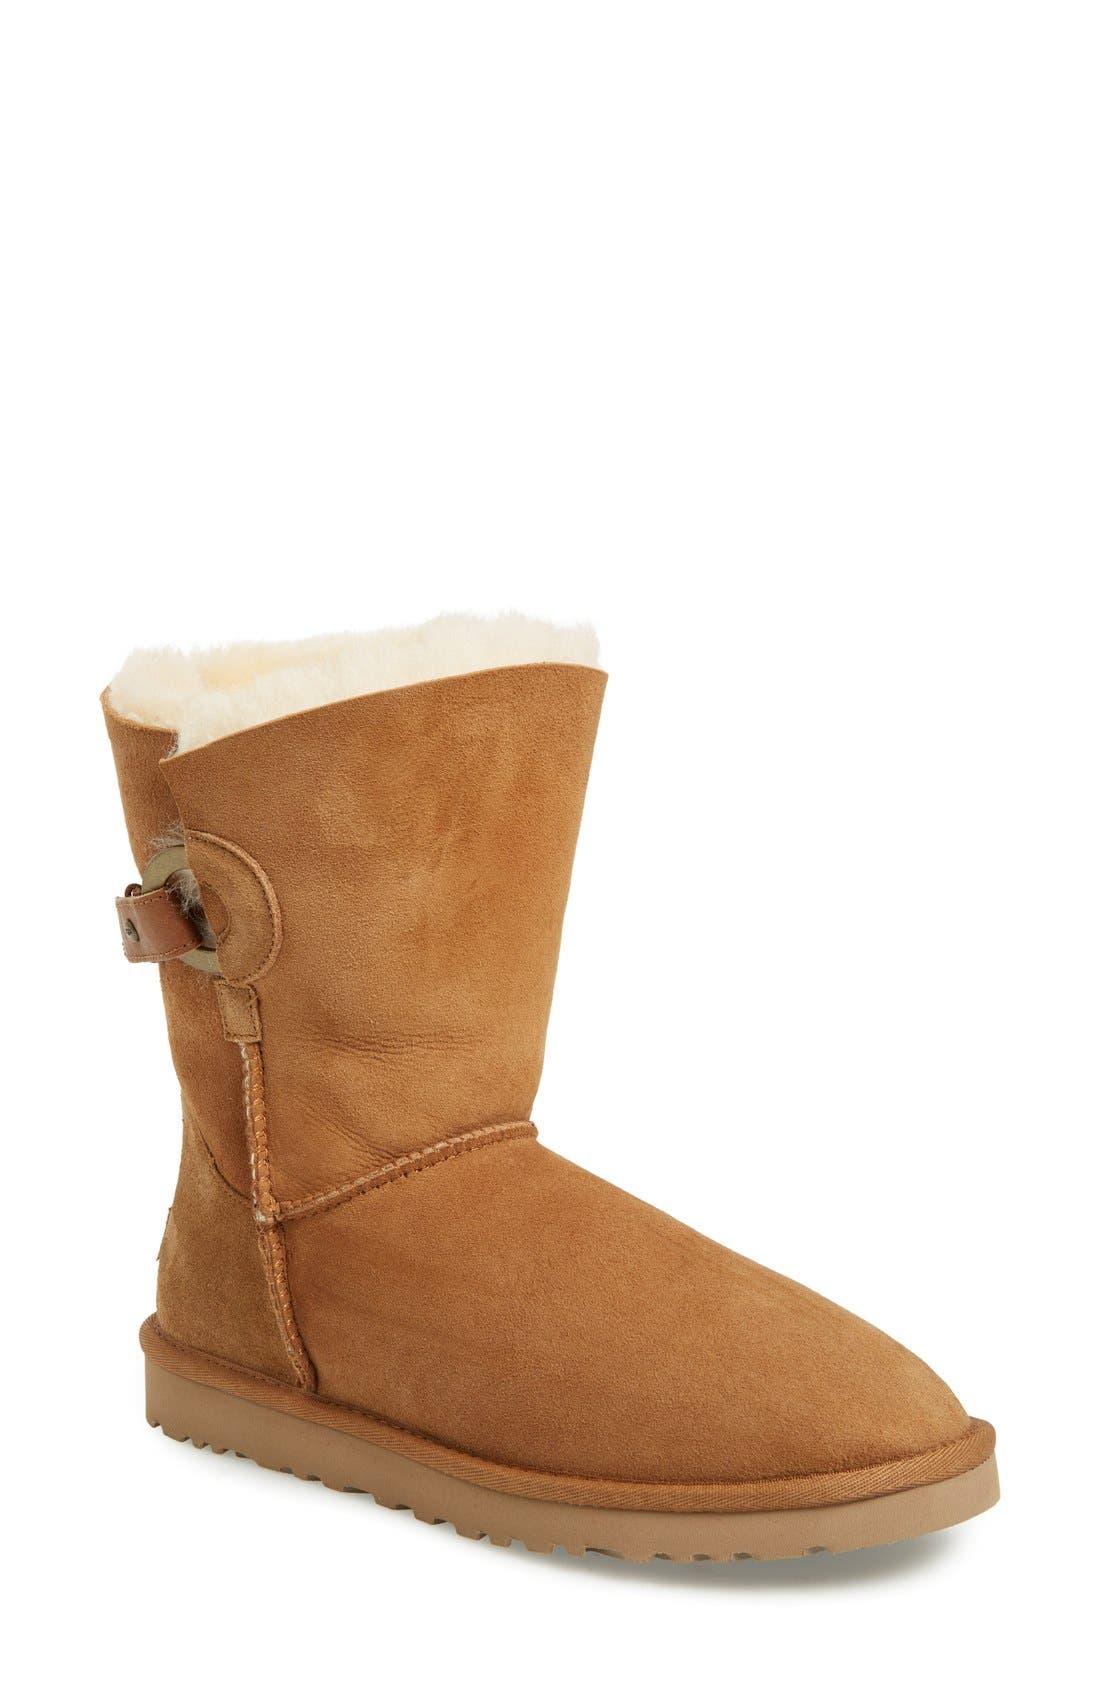 Alternate Image 1 Selected - UGG® Nash Genuine Shearling Boot (Women)